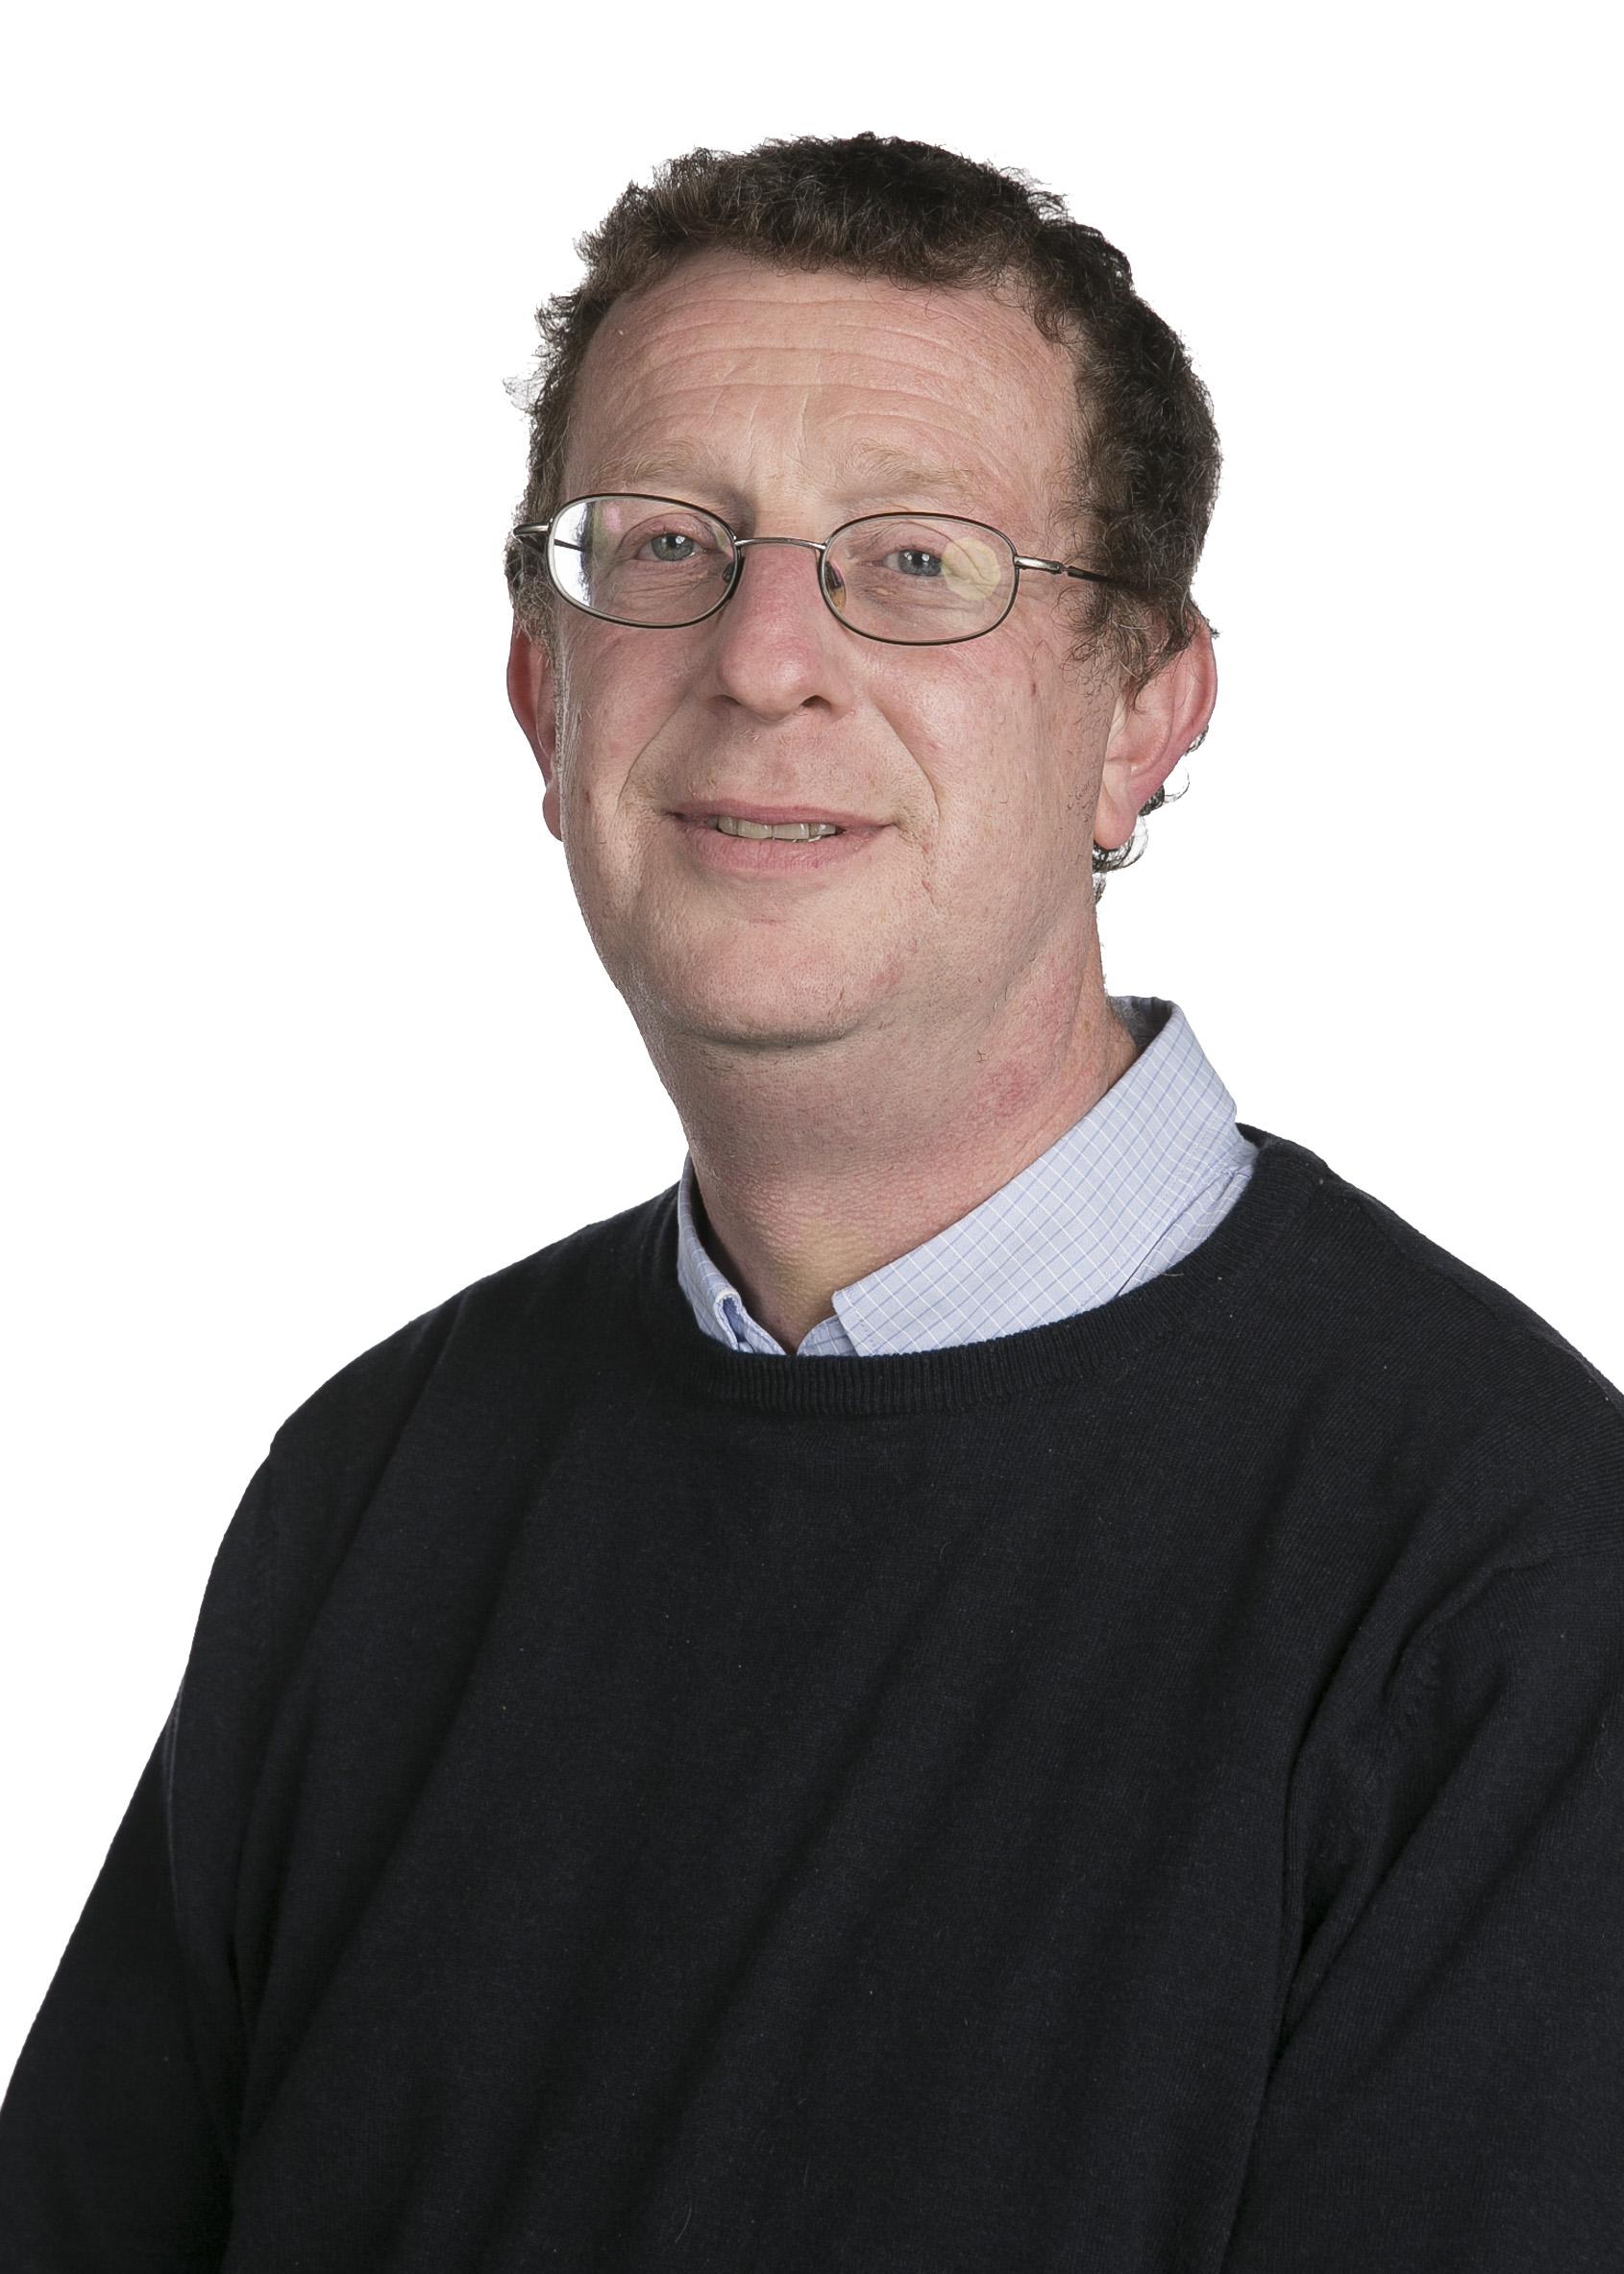 John McAvoy